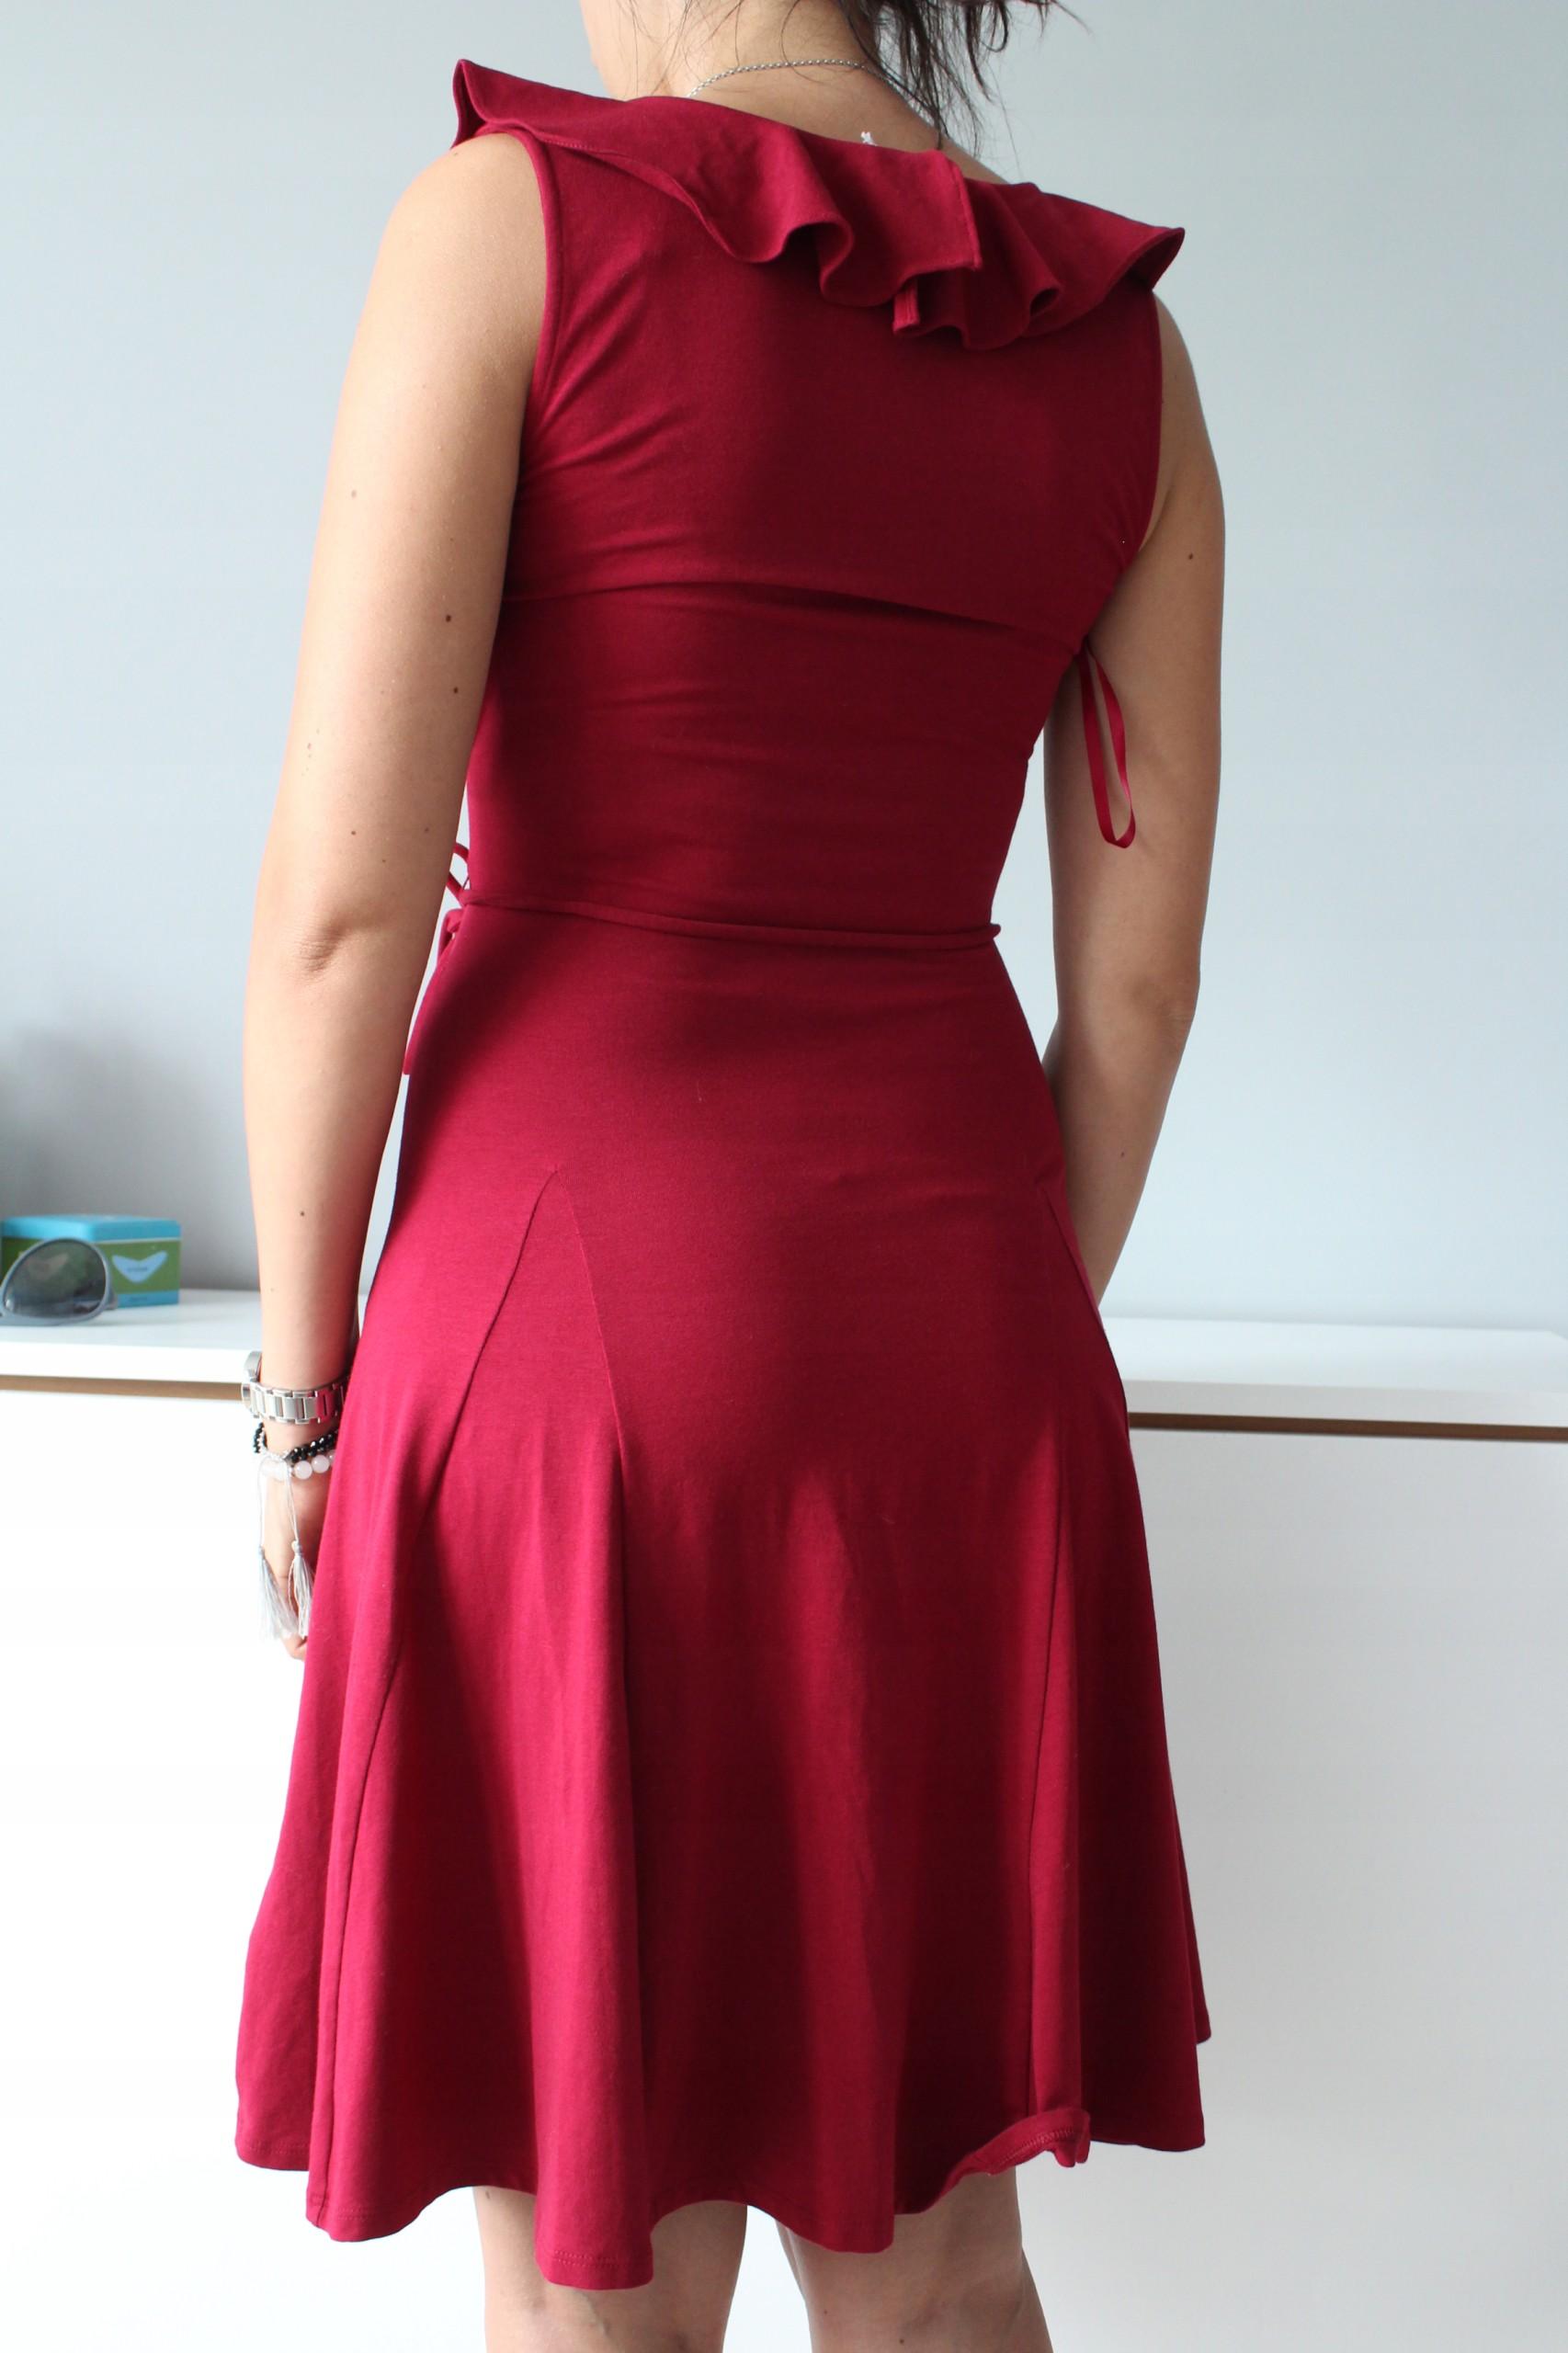 3e5d63d762 Piękna RALPH LAUREN Bordowa Sukienka USA NOWA S - 7475756185 ...